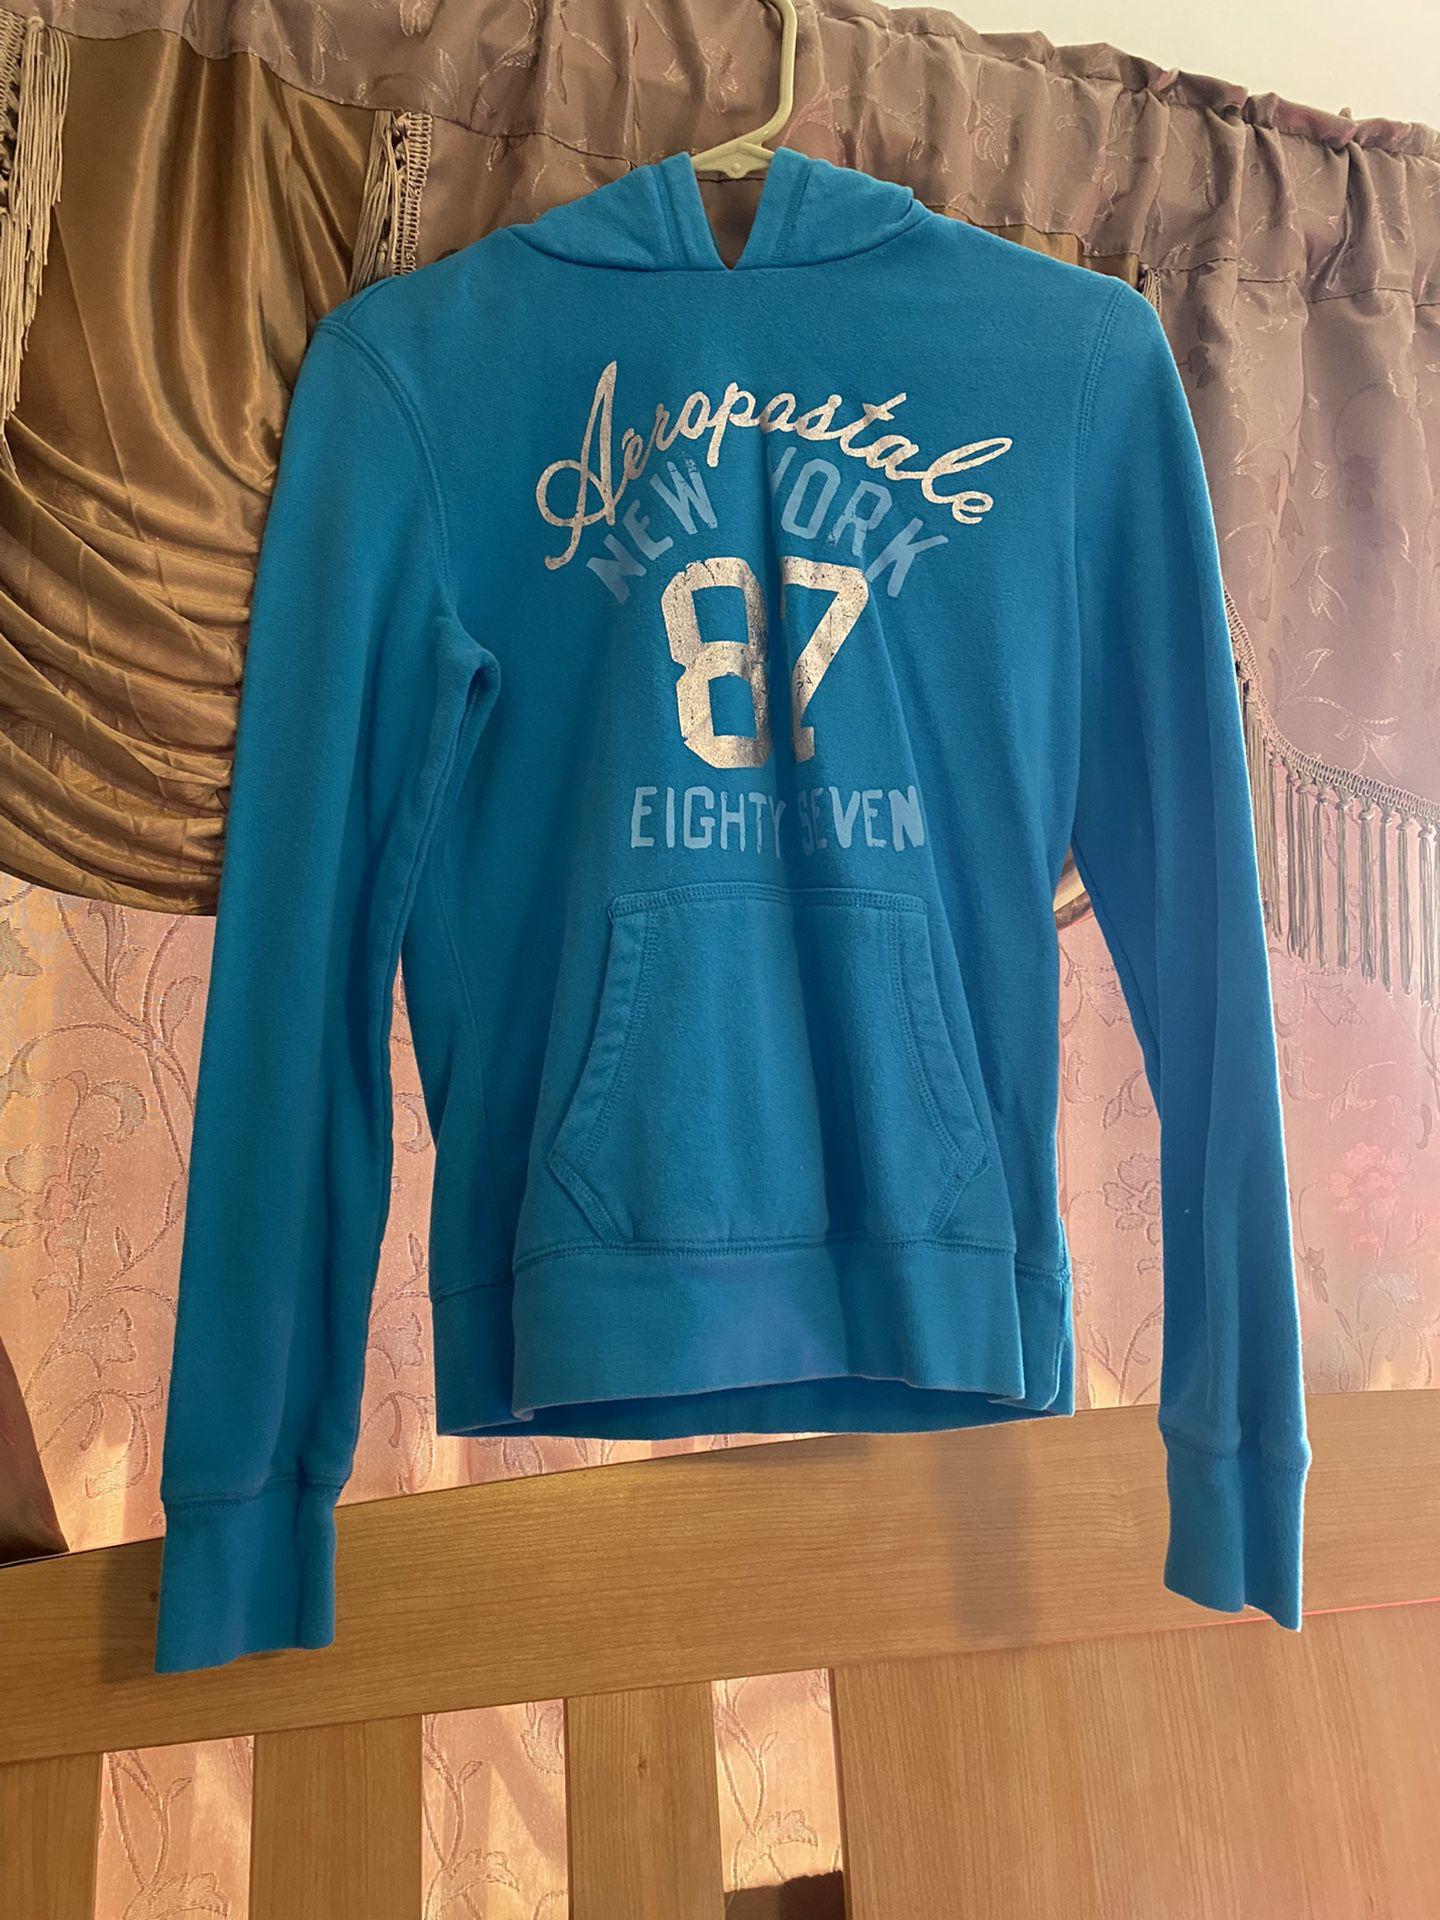 Aueropostale Sweater Blue Size M $10